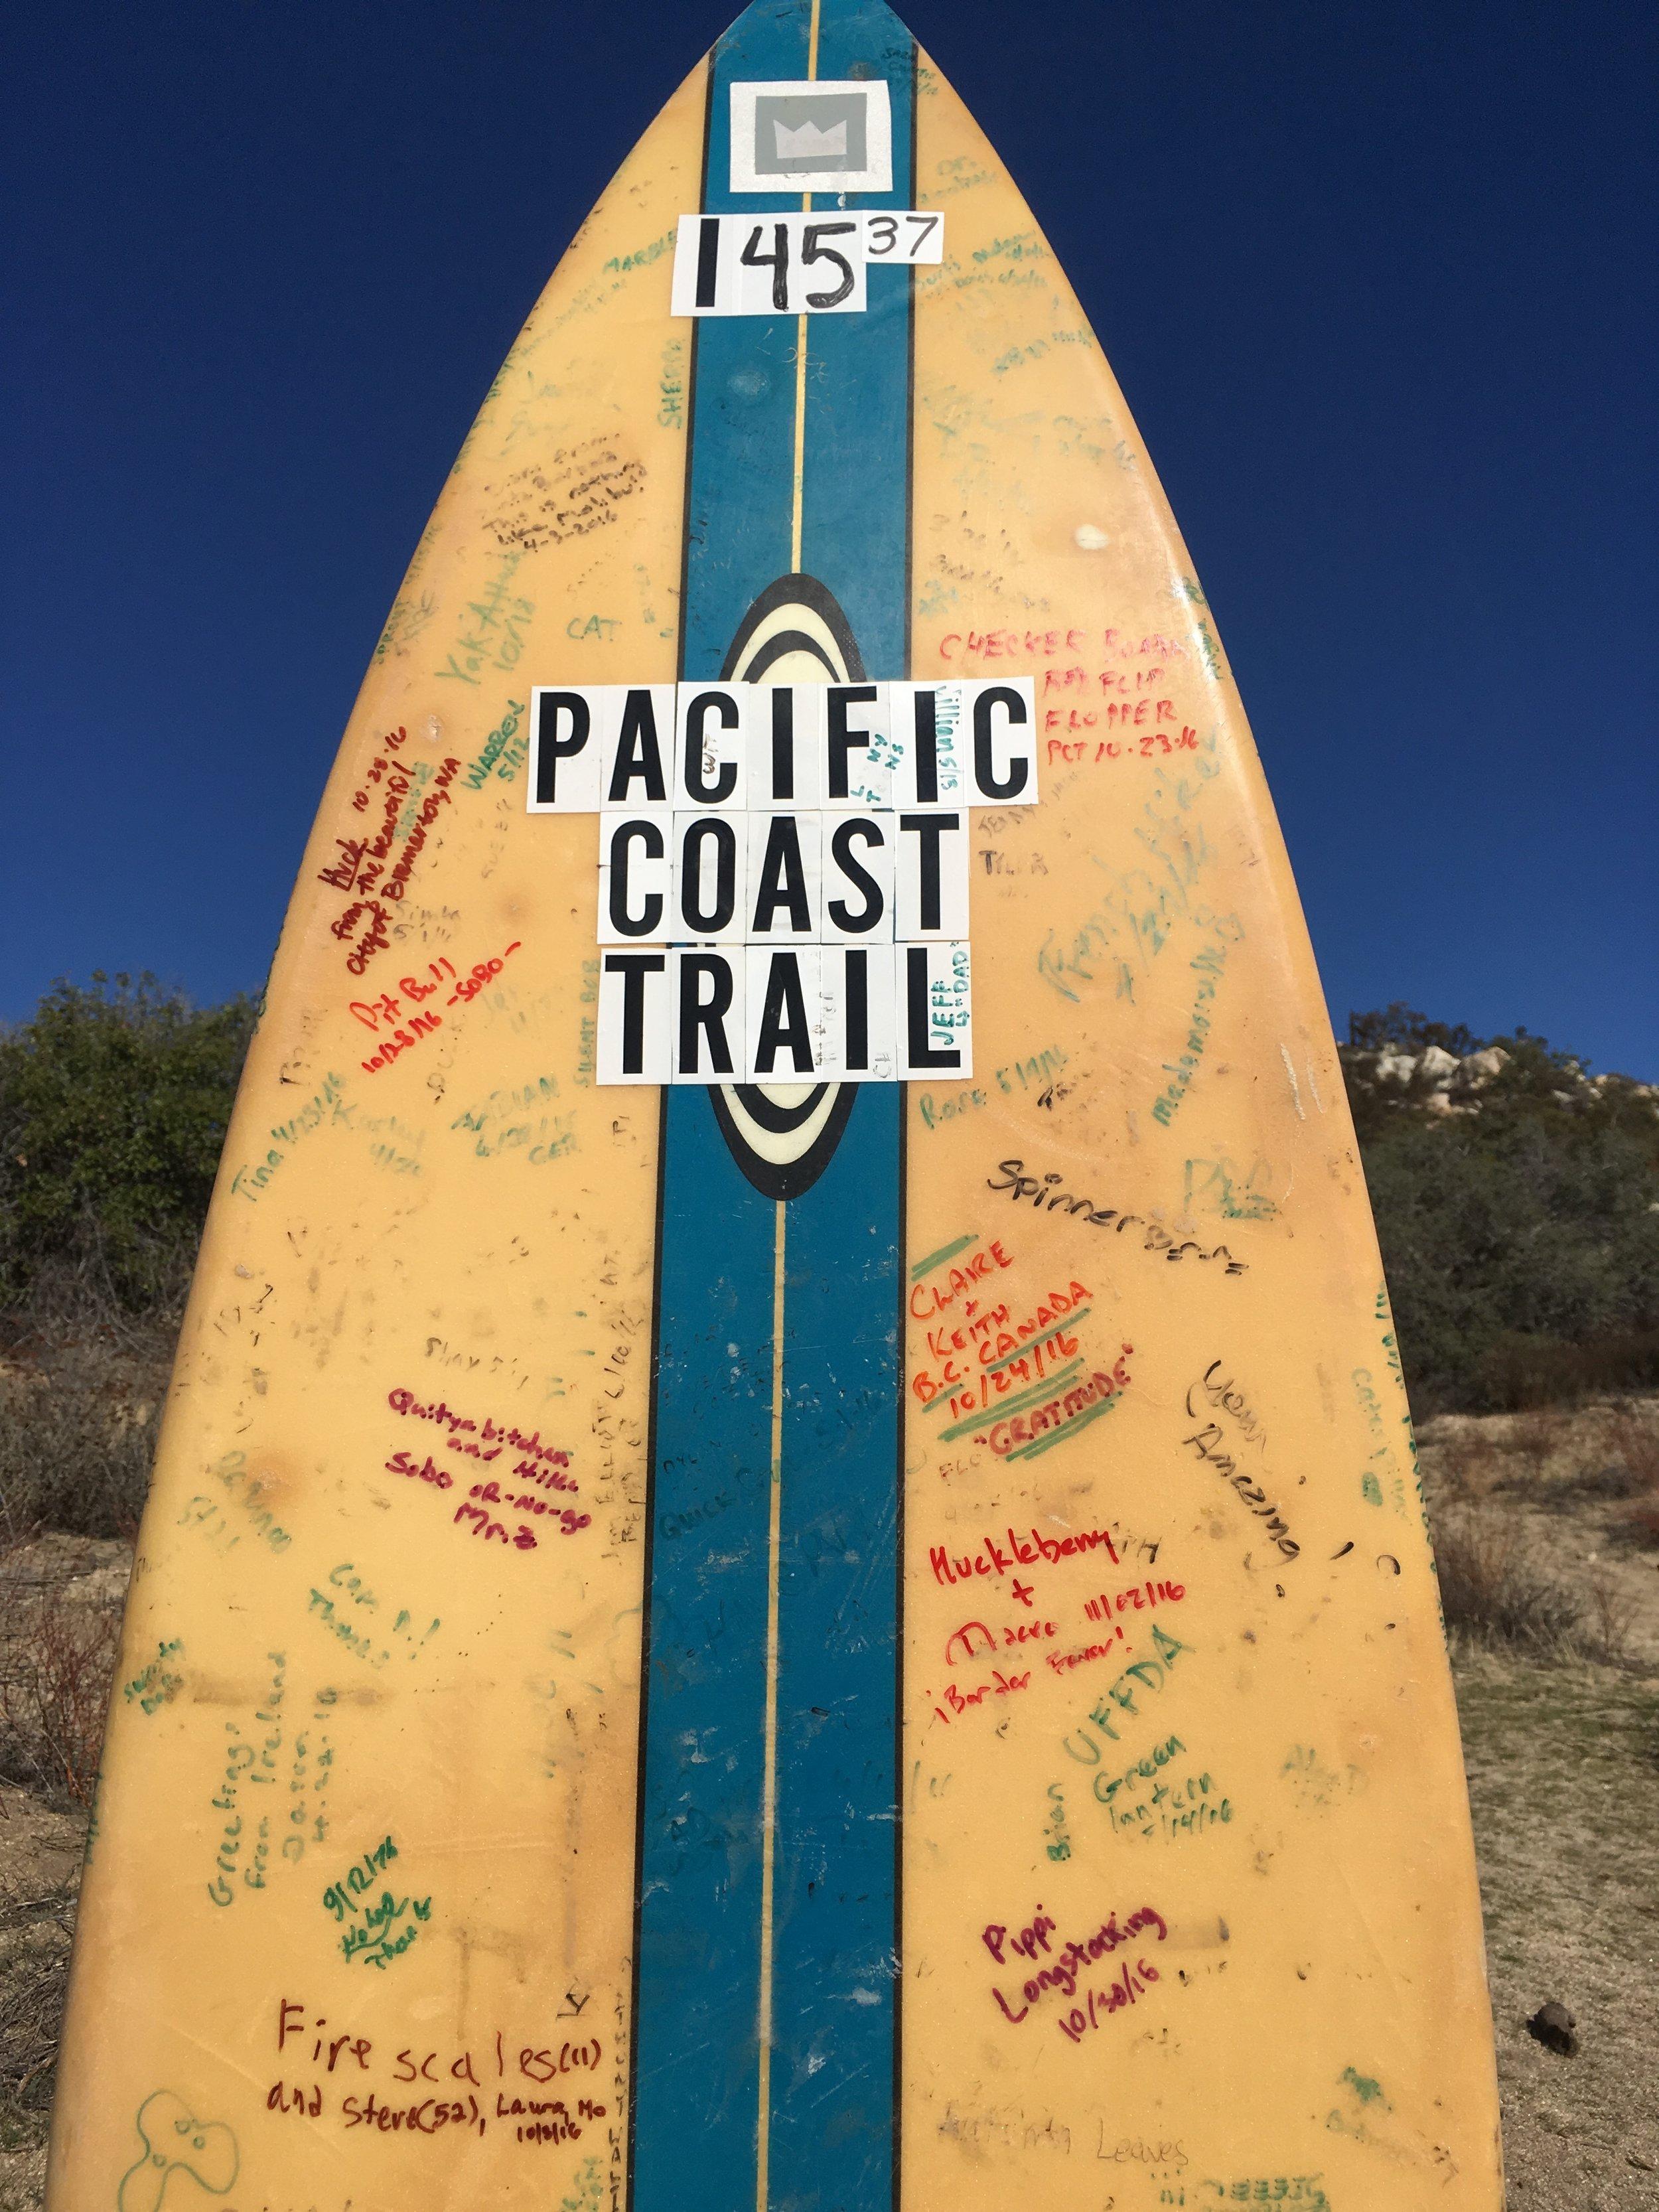 Huckleberry & Macro - ¡Border Fever! at Malibu East, or PCT Mile 145.37